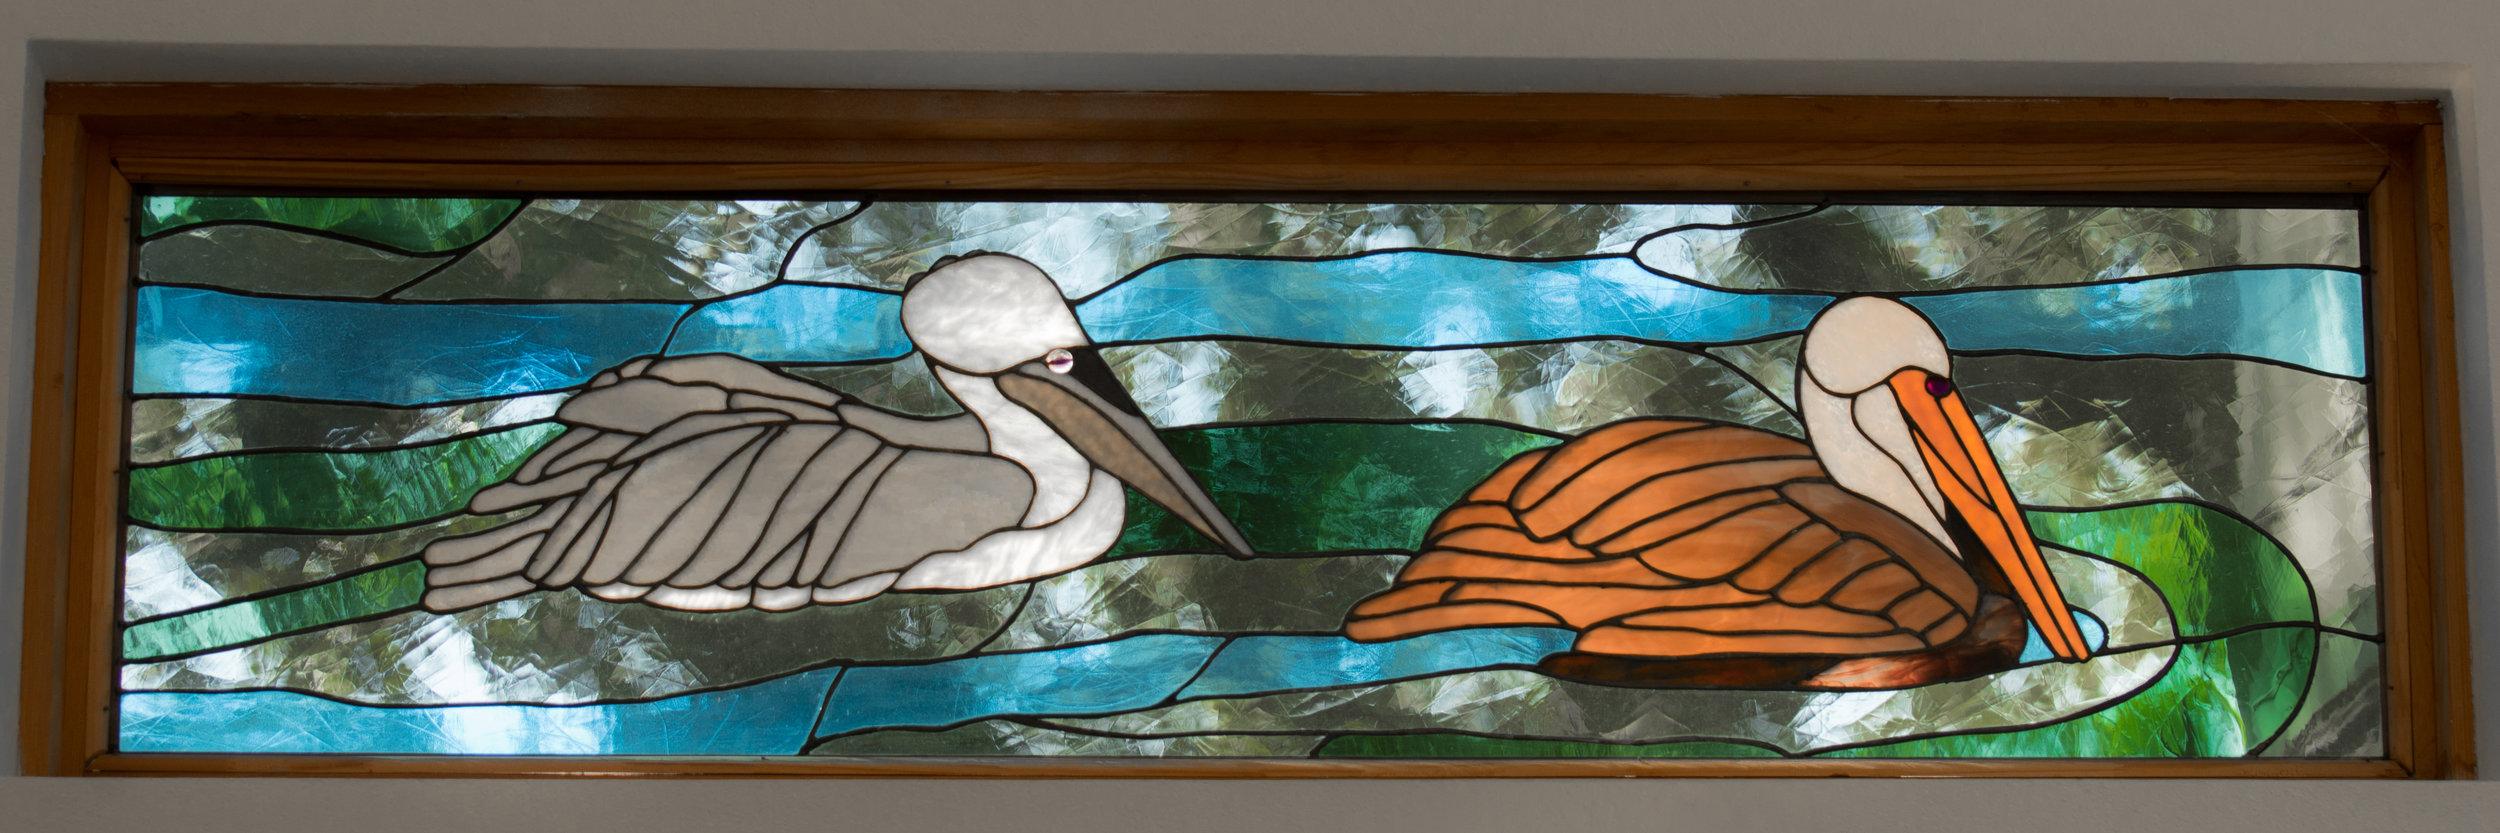 Pelican Cove - 2003